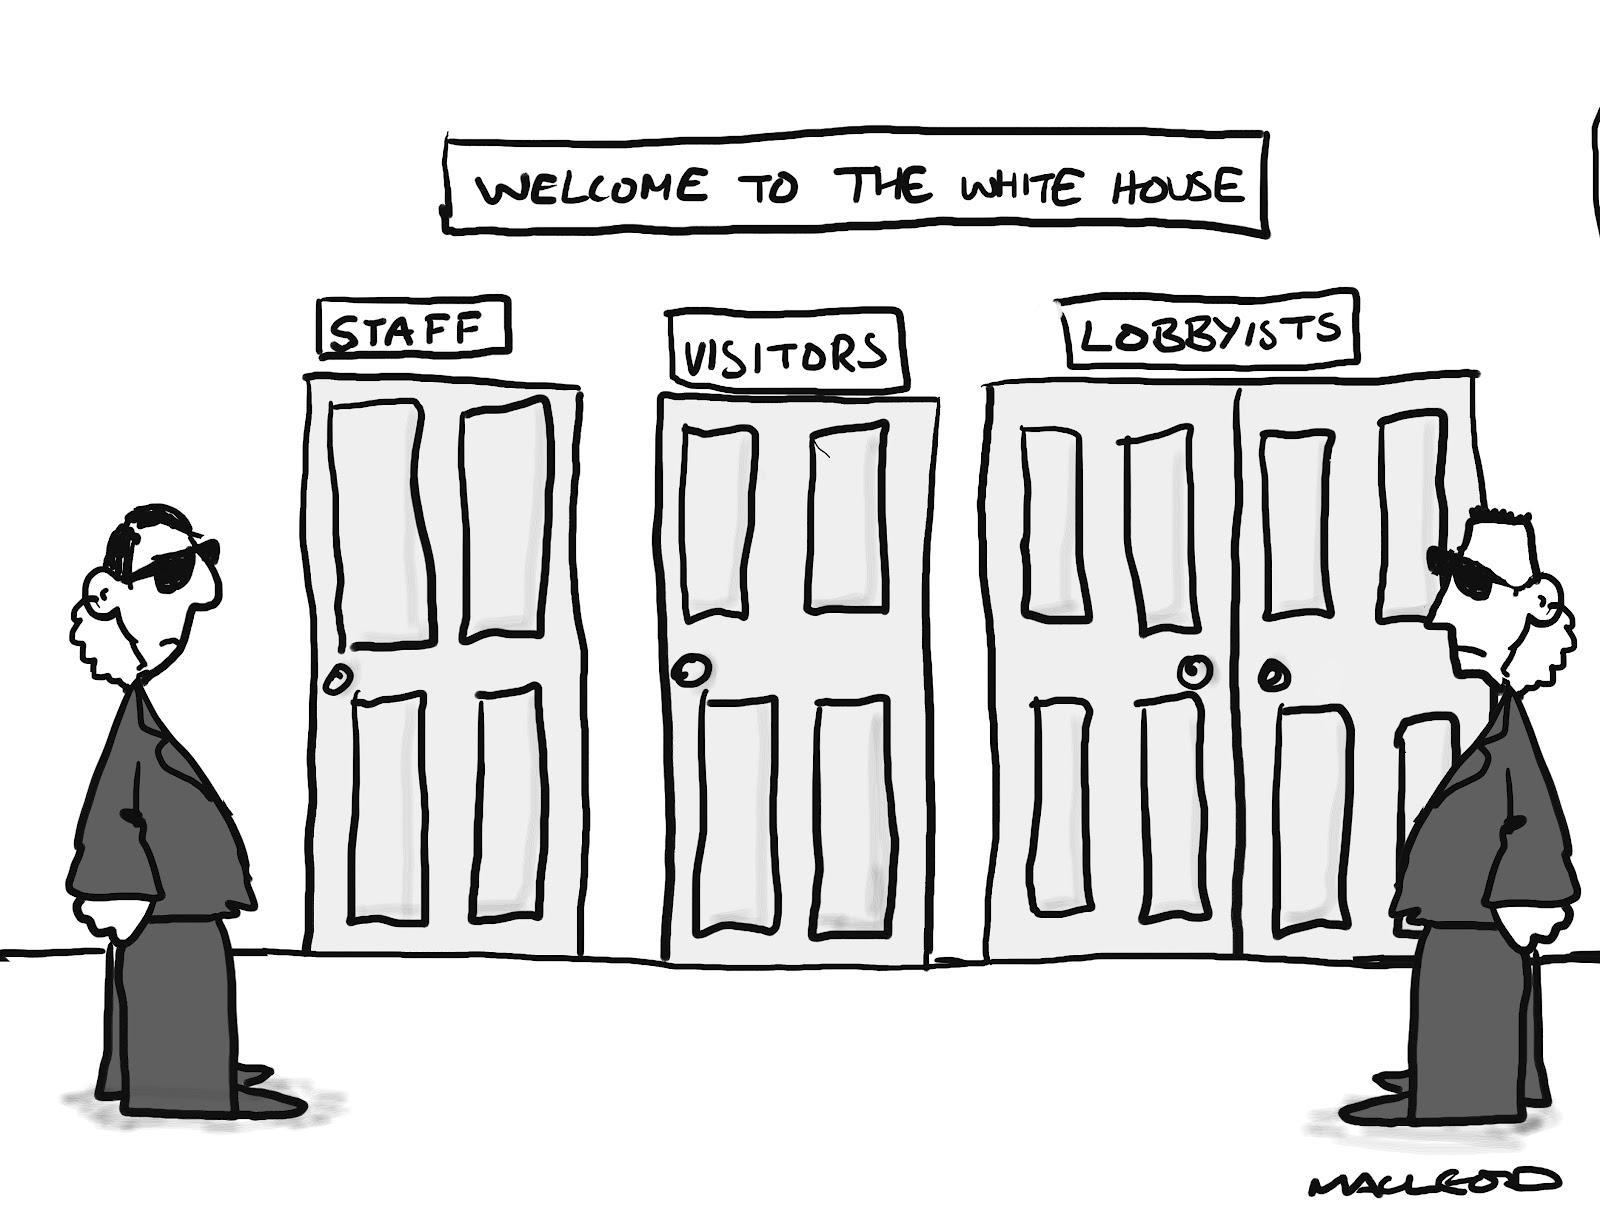 MacLeod Cartoons: White House and Lobbyists